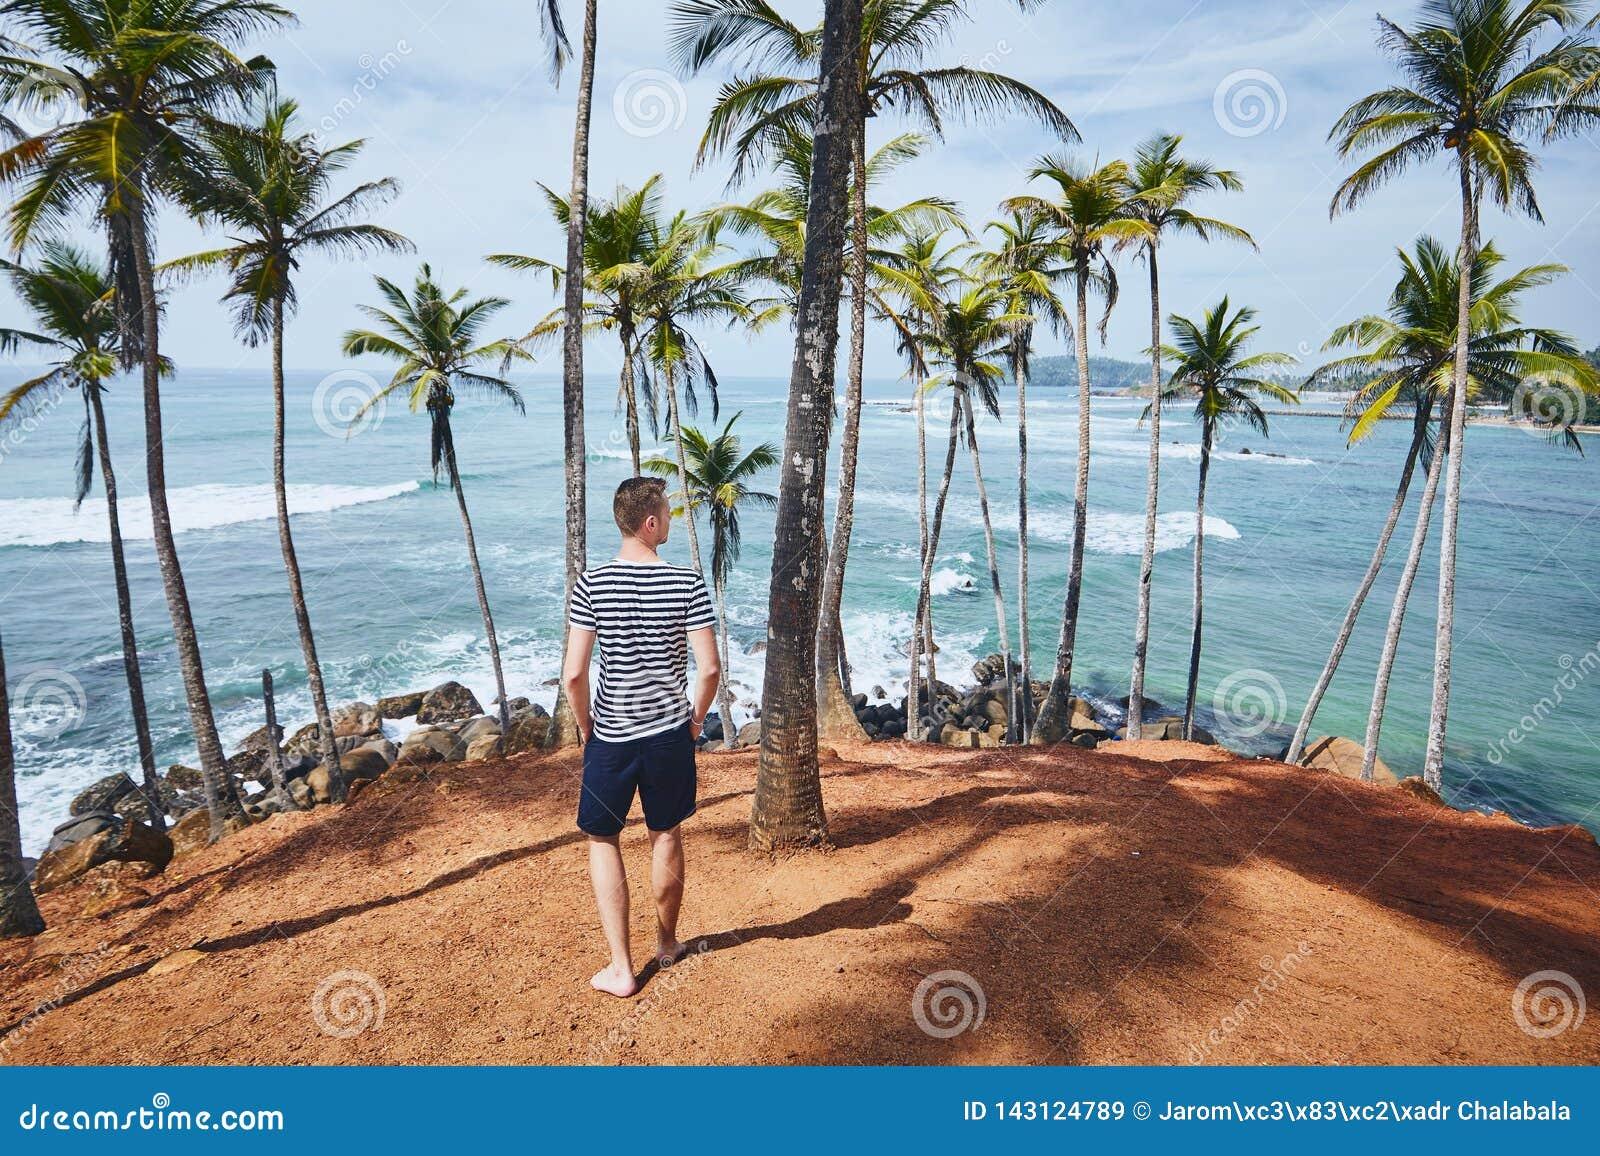 Idyllische dag in tropische bestemming